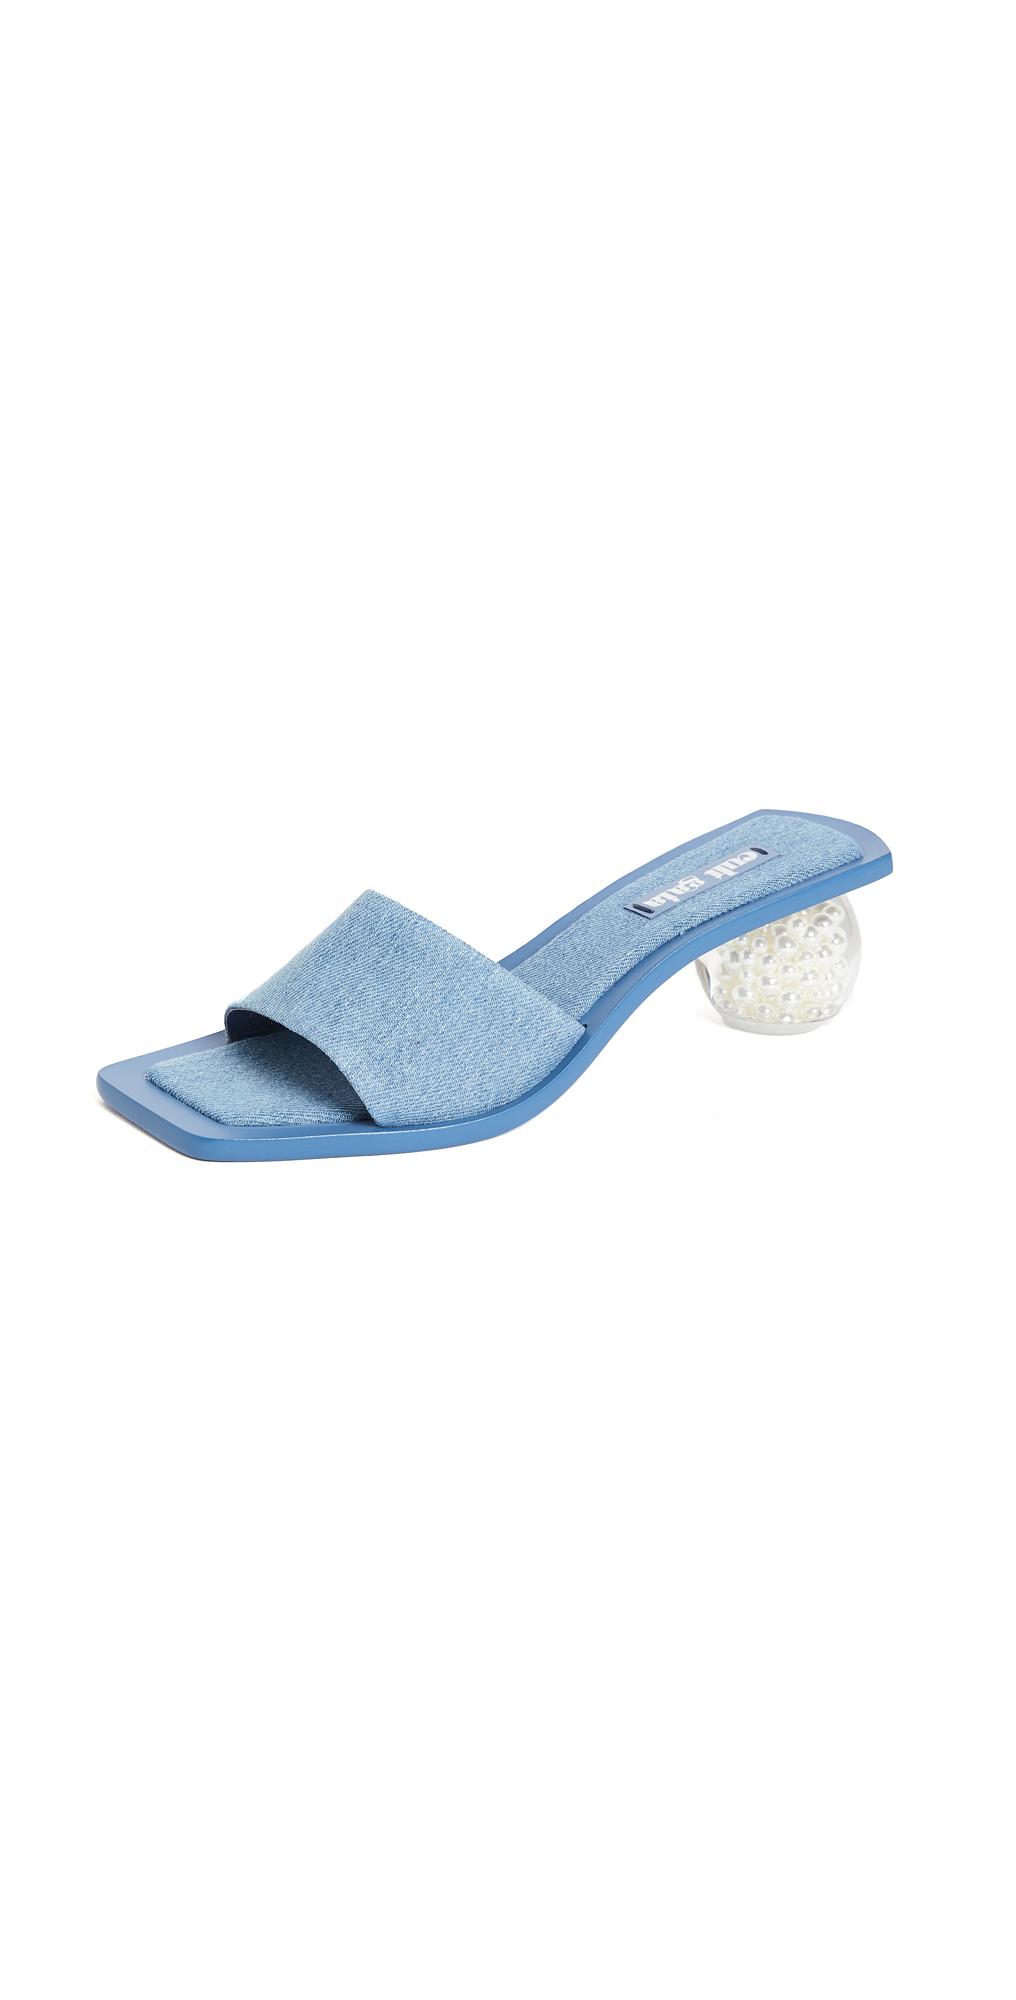 Cult Gaia Tao Denim Sandals